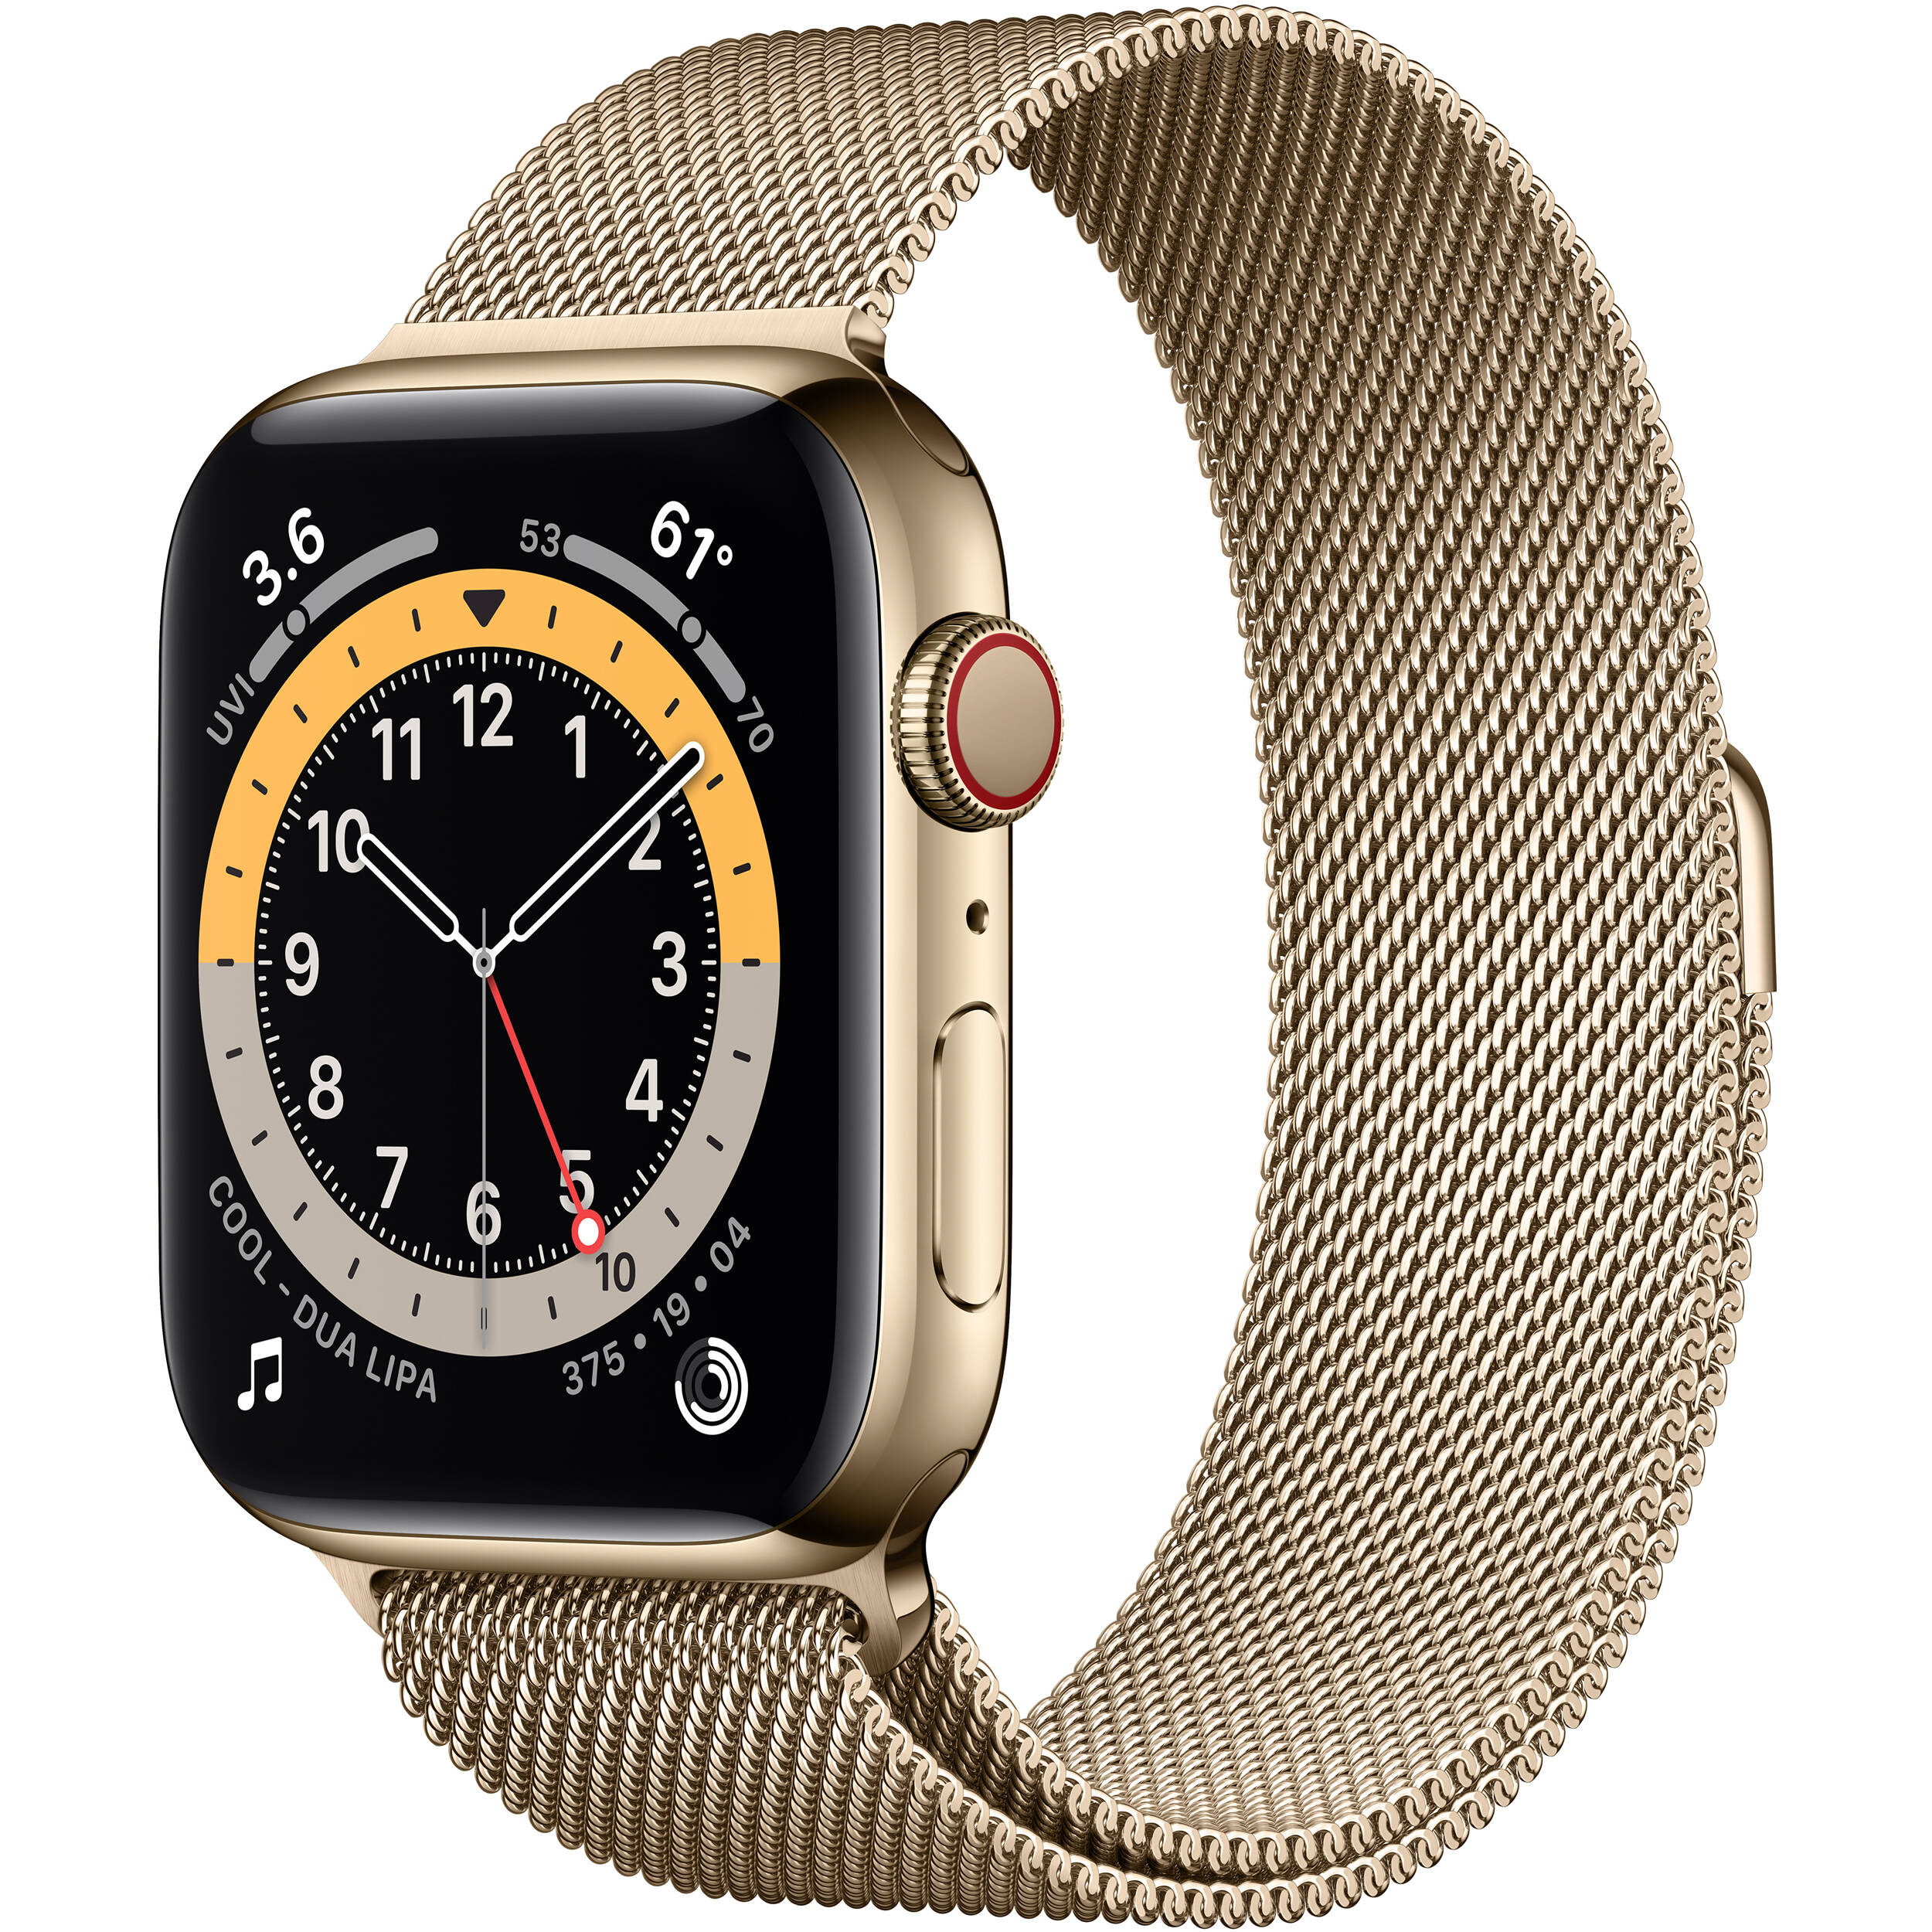 Apple Watch Series 6 M07P3LL/A B&H Photo Video